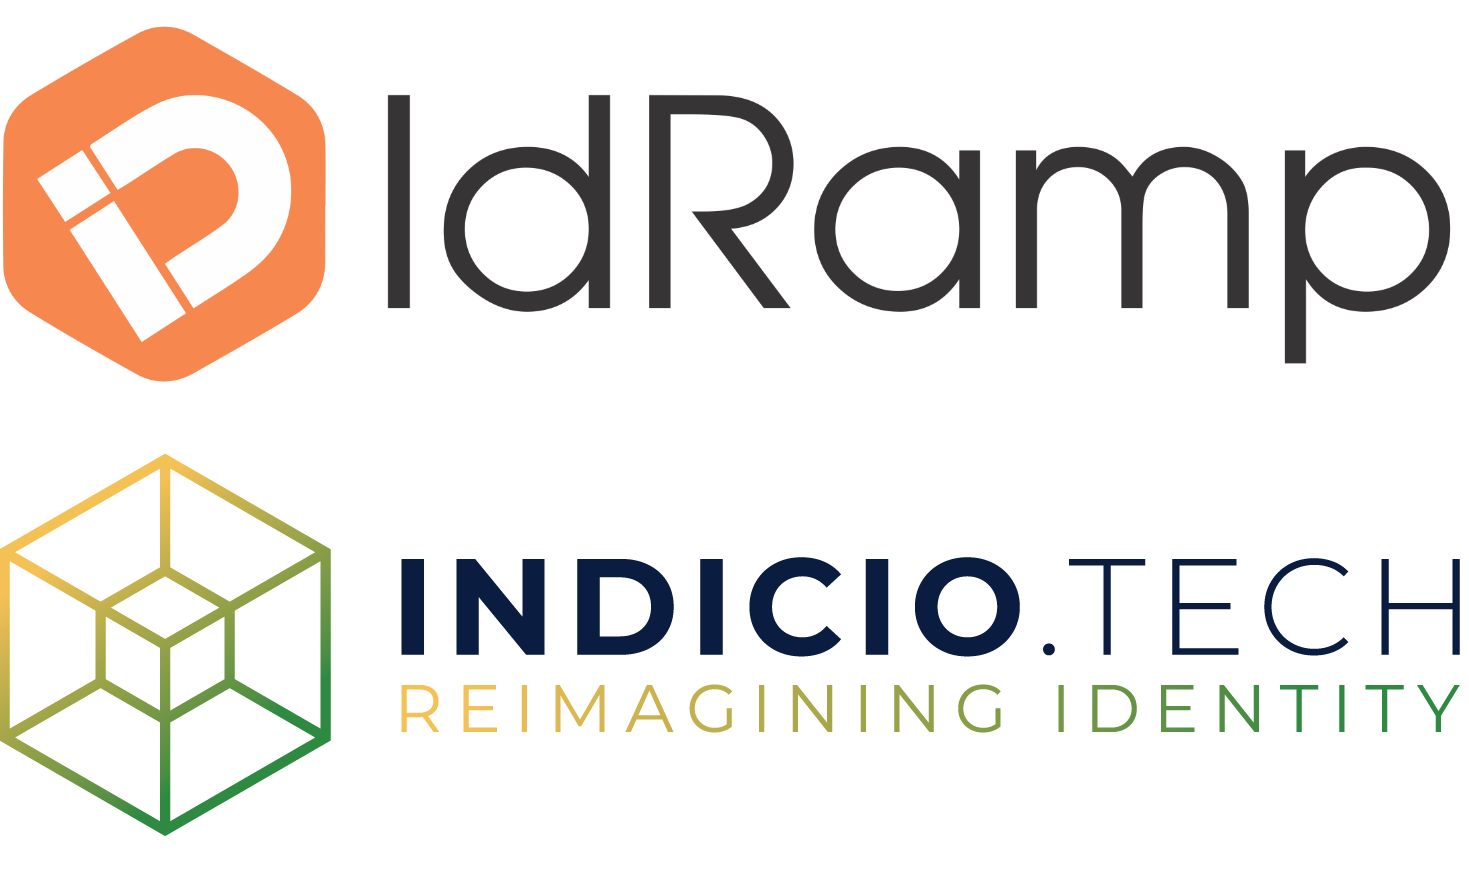 IdRamp Offers Market-Ready Decentralized Identity Platform on the Indicio Network